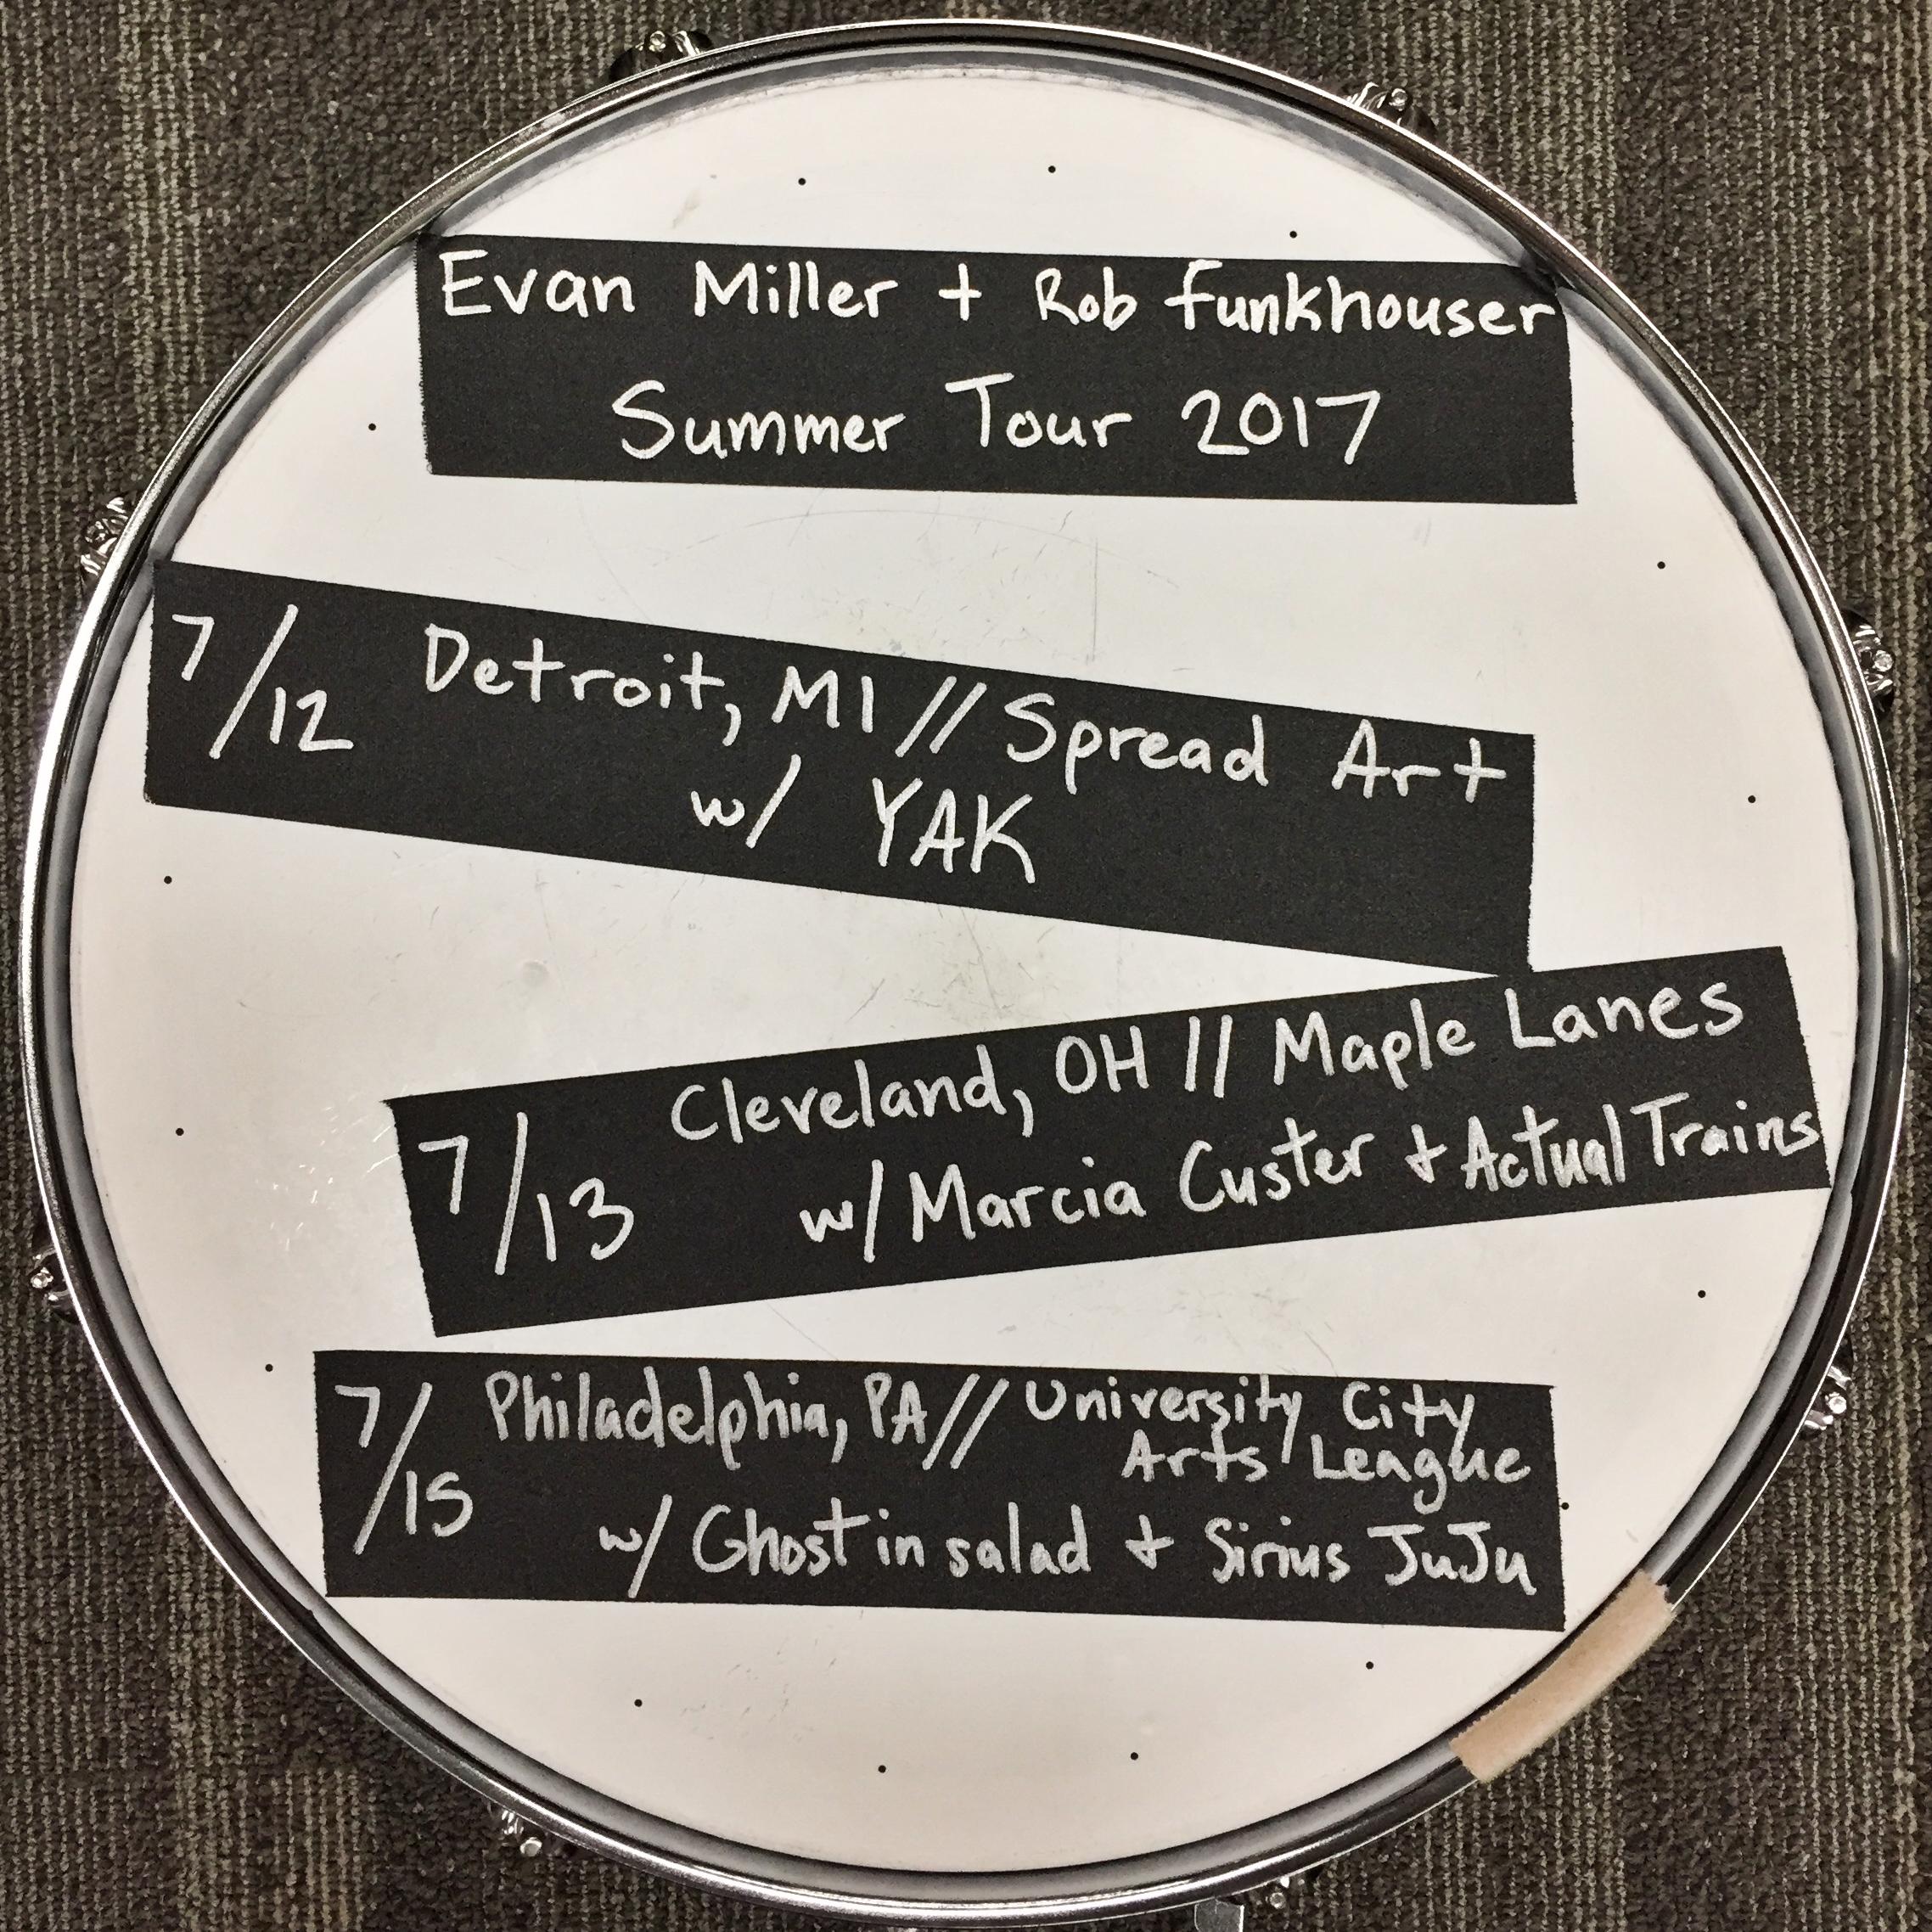 Rob and Evan Summer 2017 Tour.jpeg